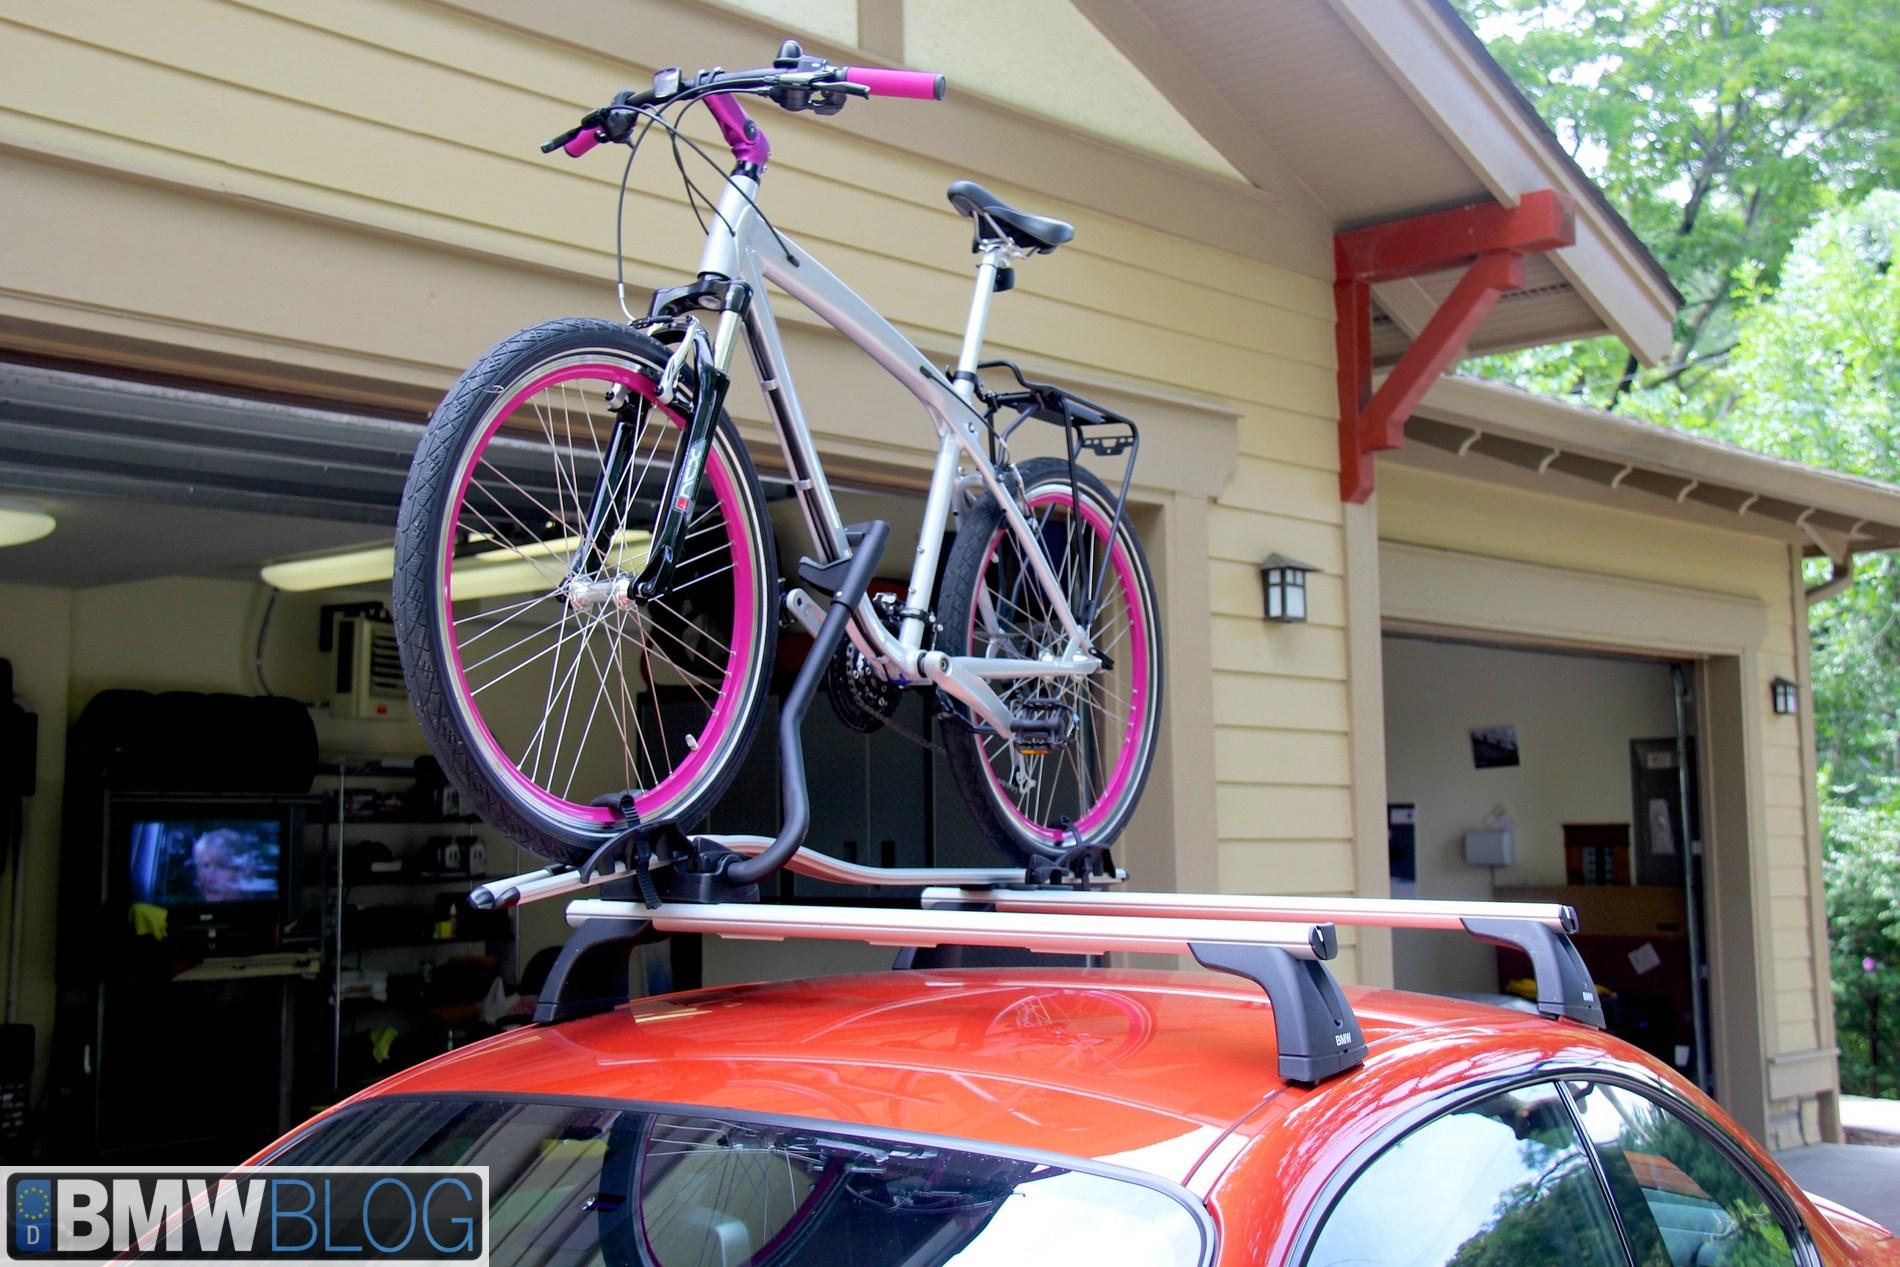 How To Install A Bmw Bike Rack